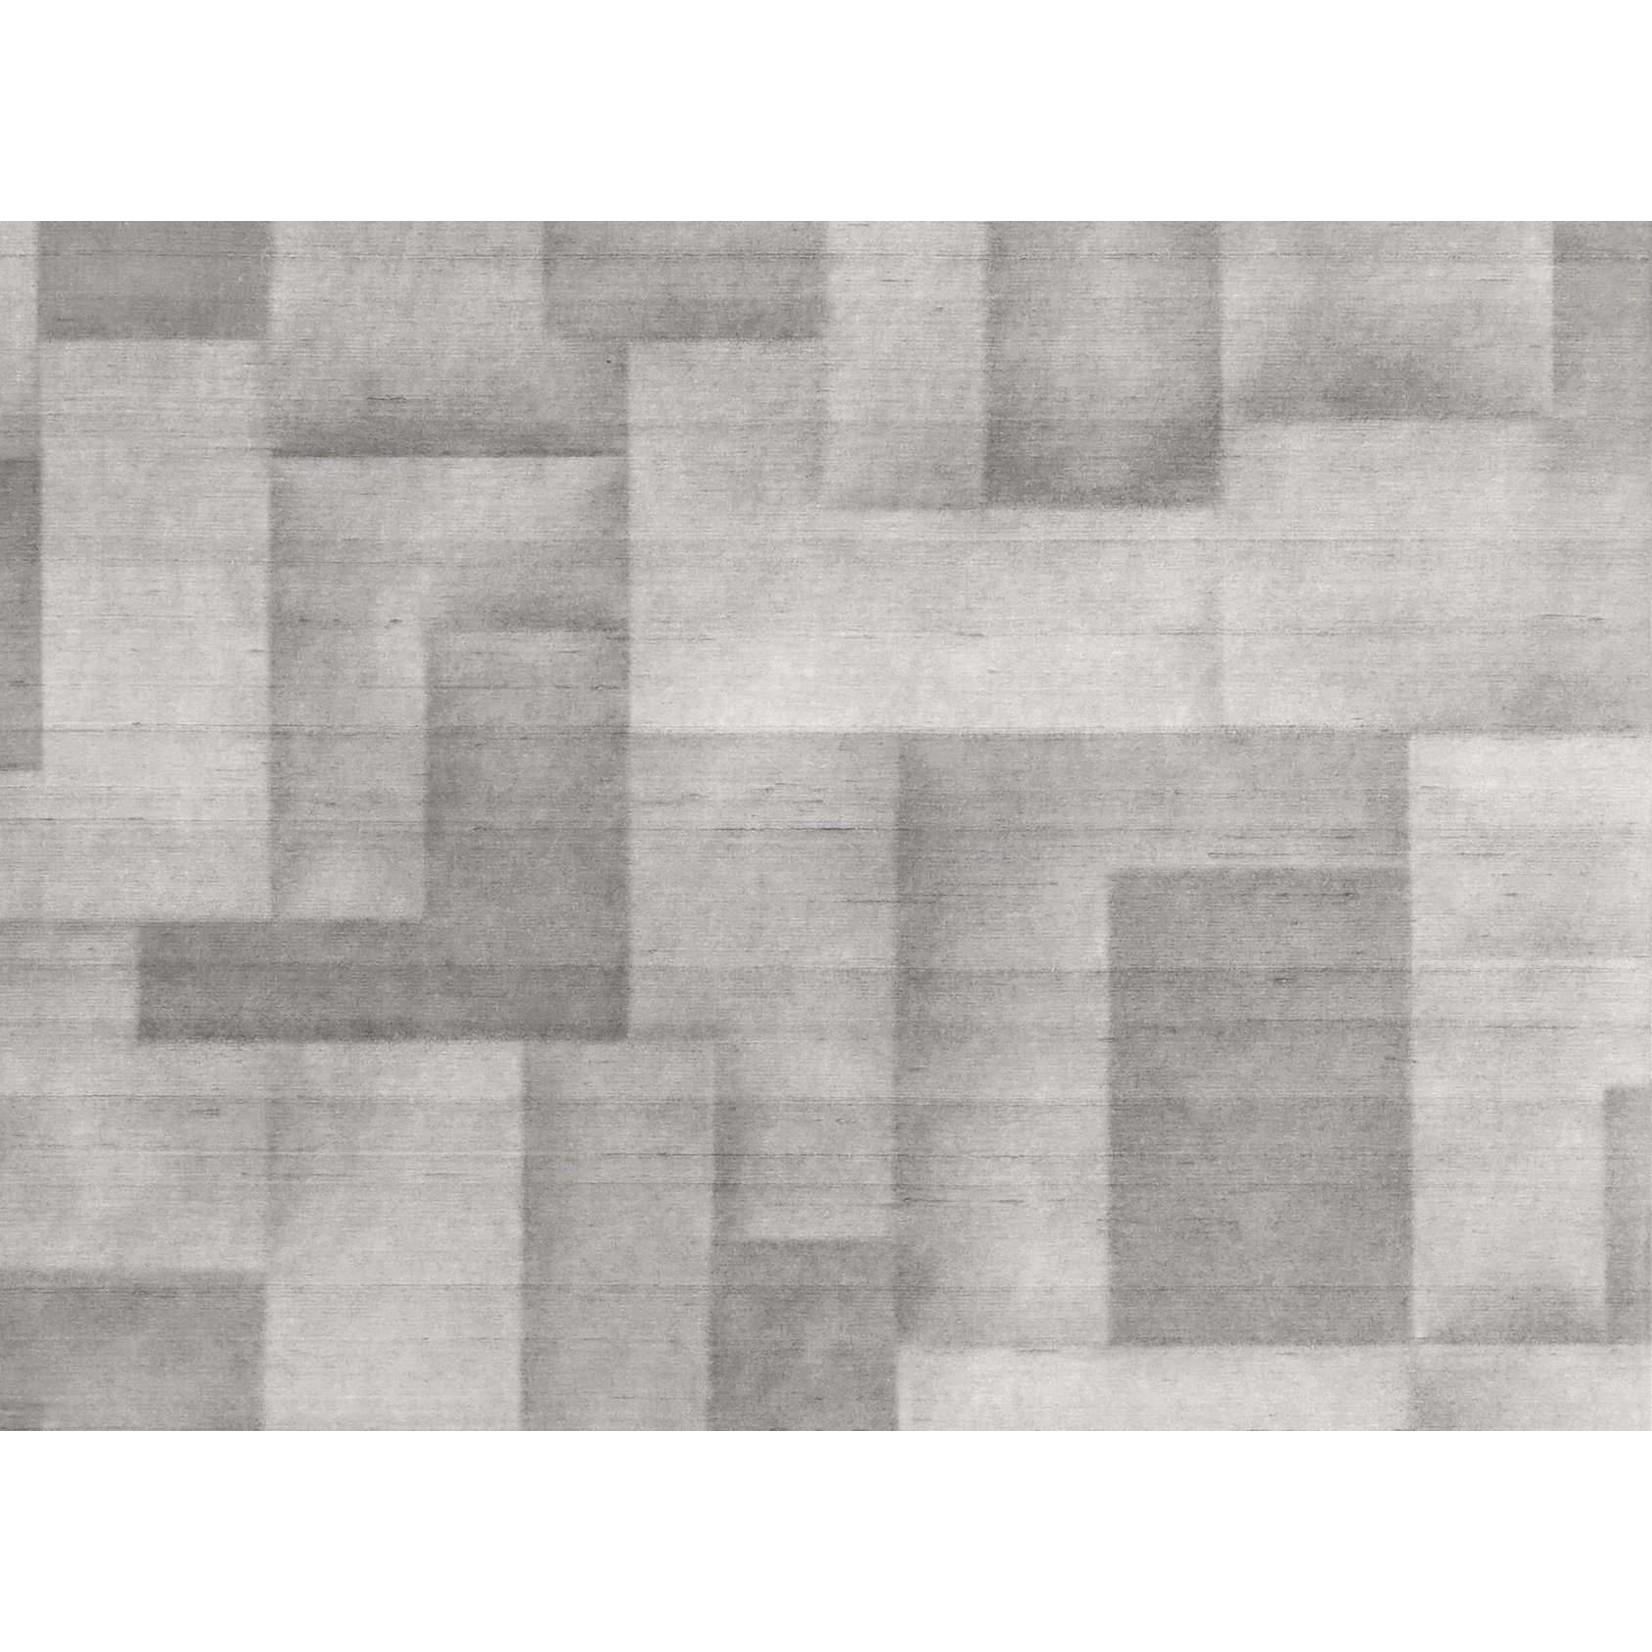 Zinc Colby | Linen